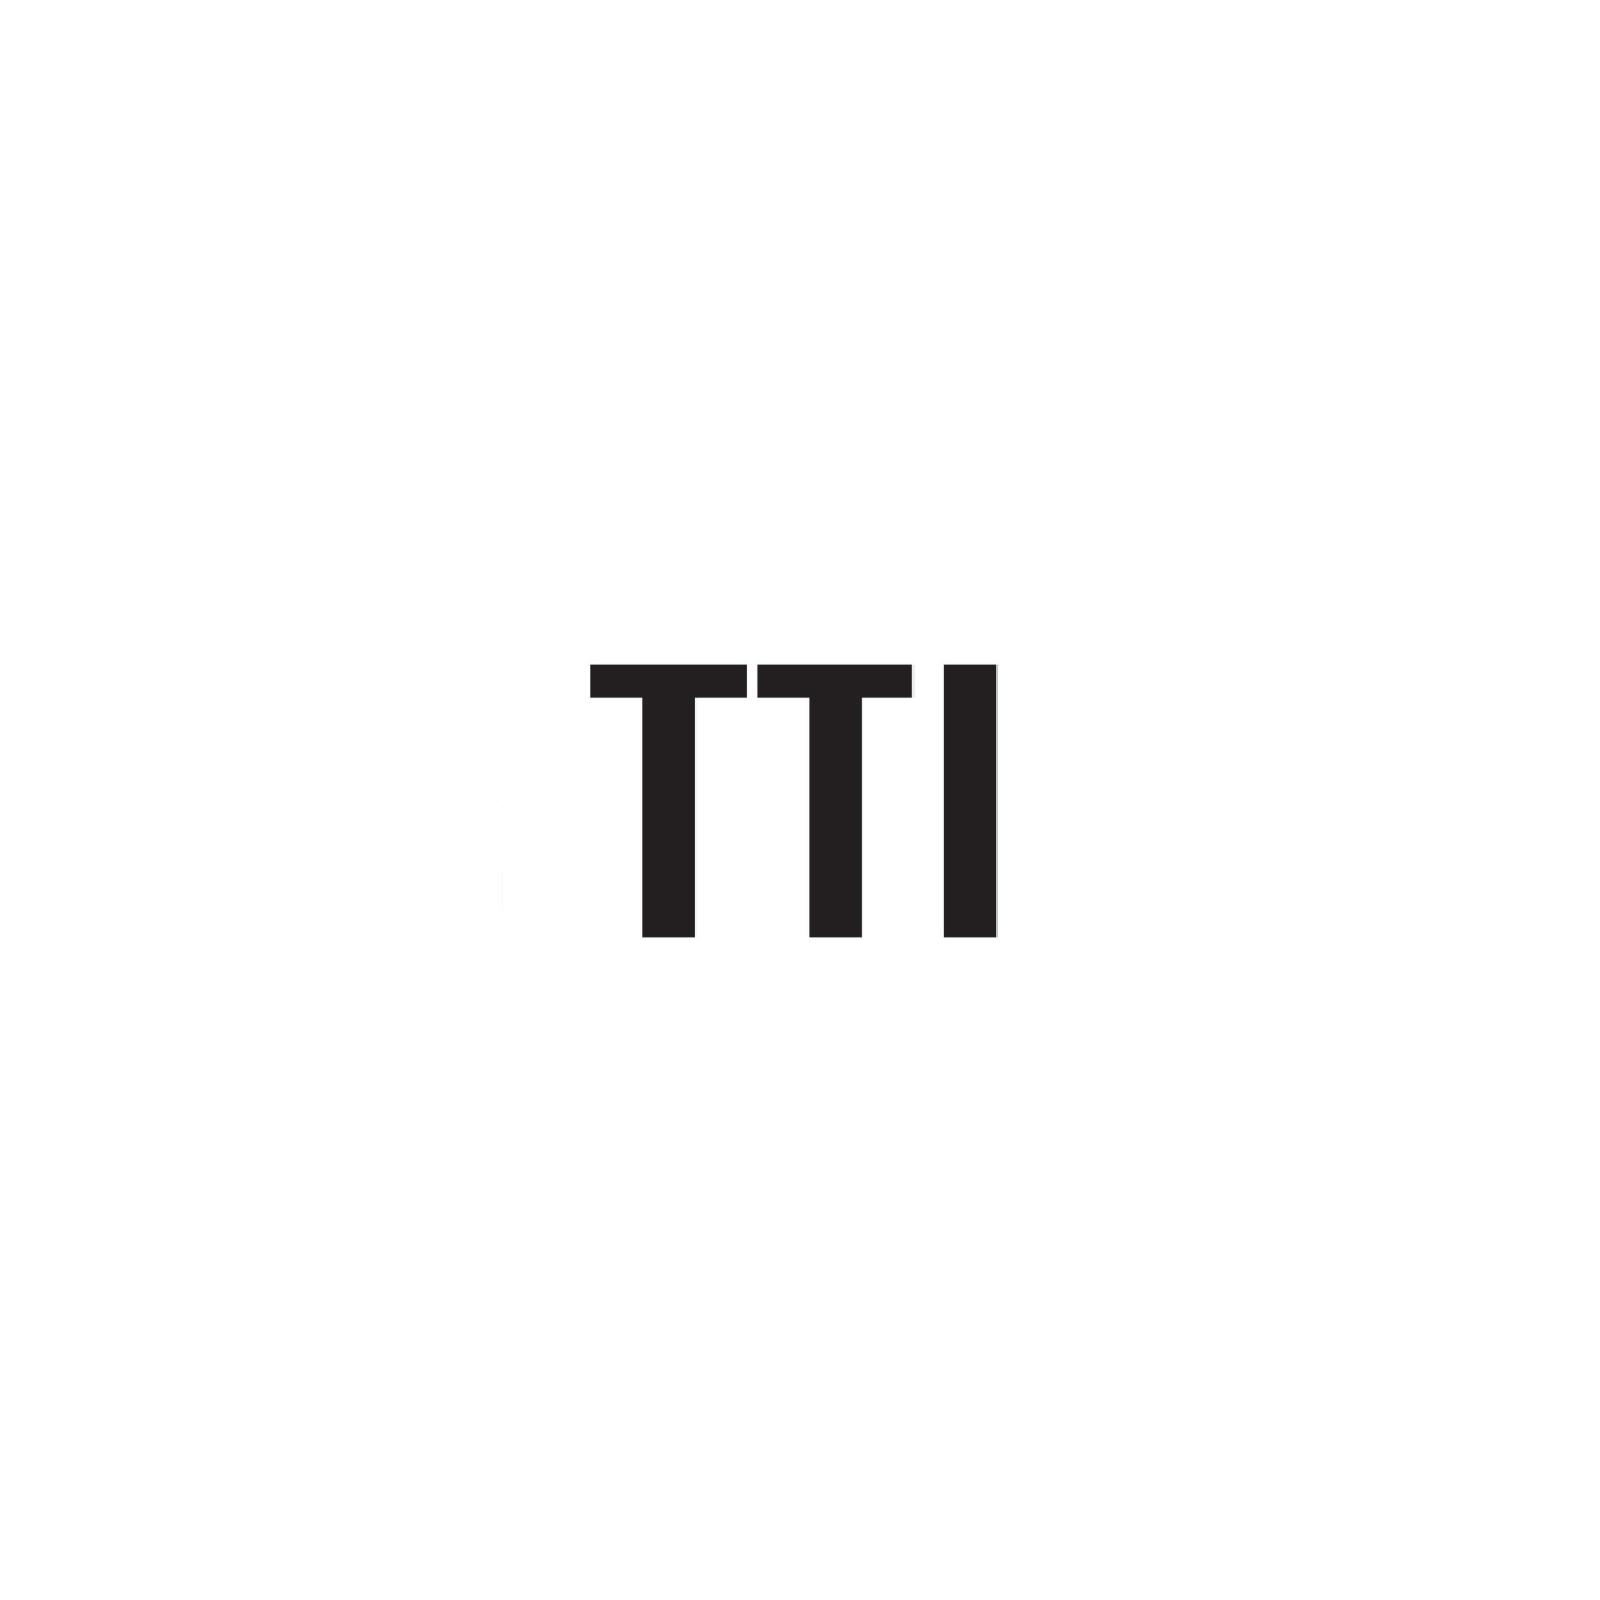 Тонер KYOCERA TK-1115/TK-1125 1кг TTI (TSM-T141-2-1)